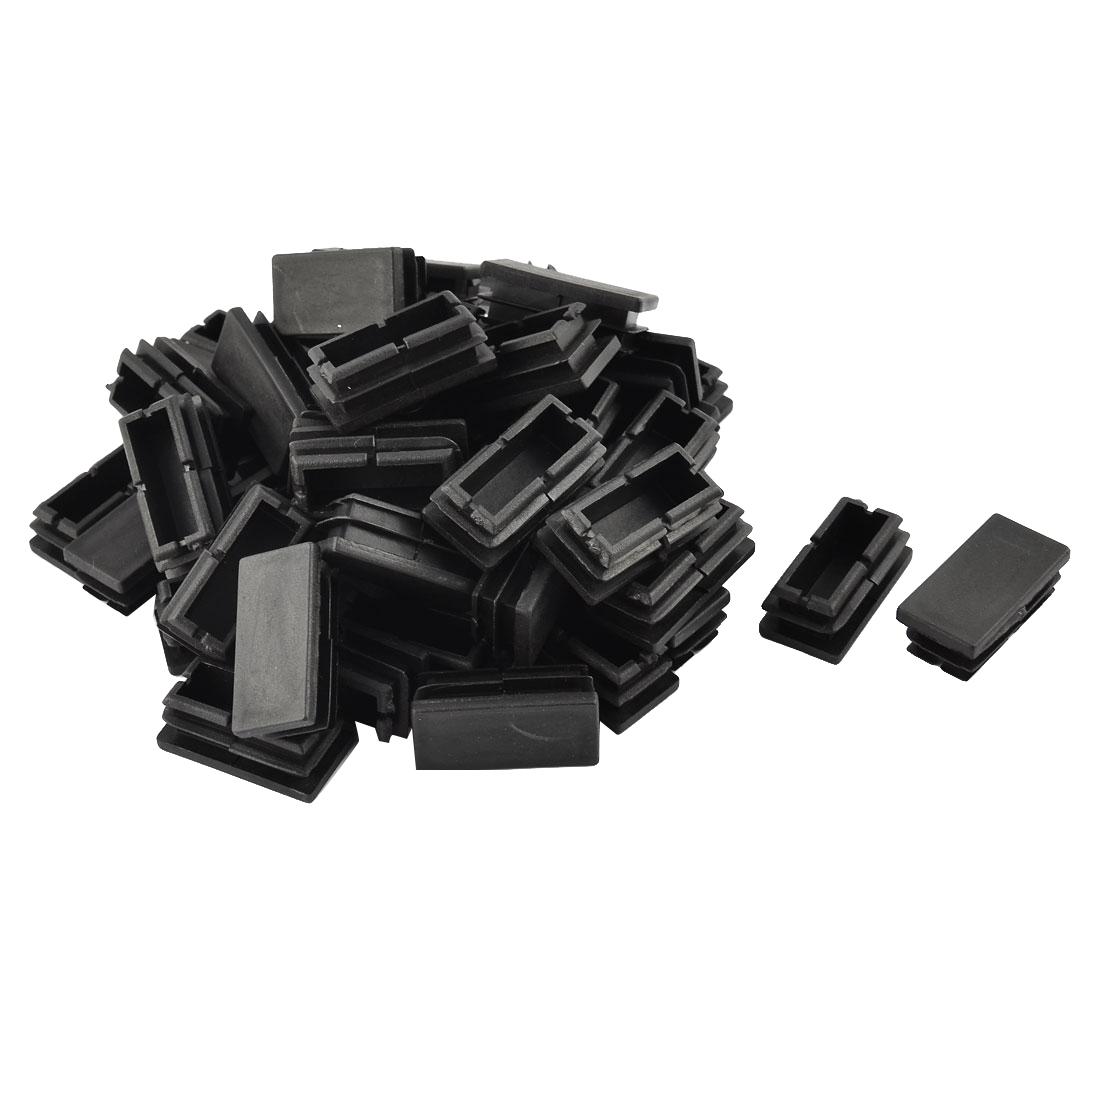 Home Cffice Plastic Rectangular Shaped Table Chair Leg Feet Tube Insert Black 50 Pcs